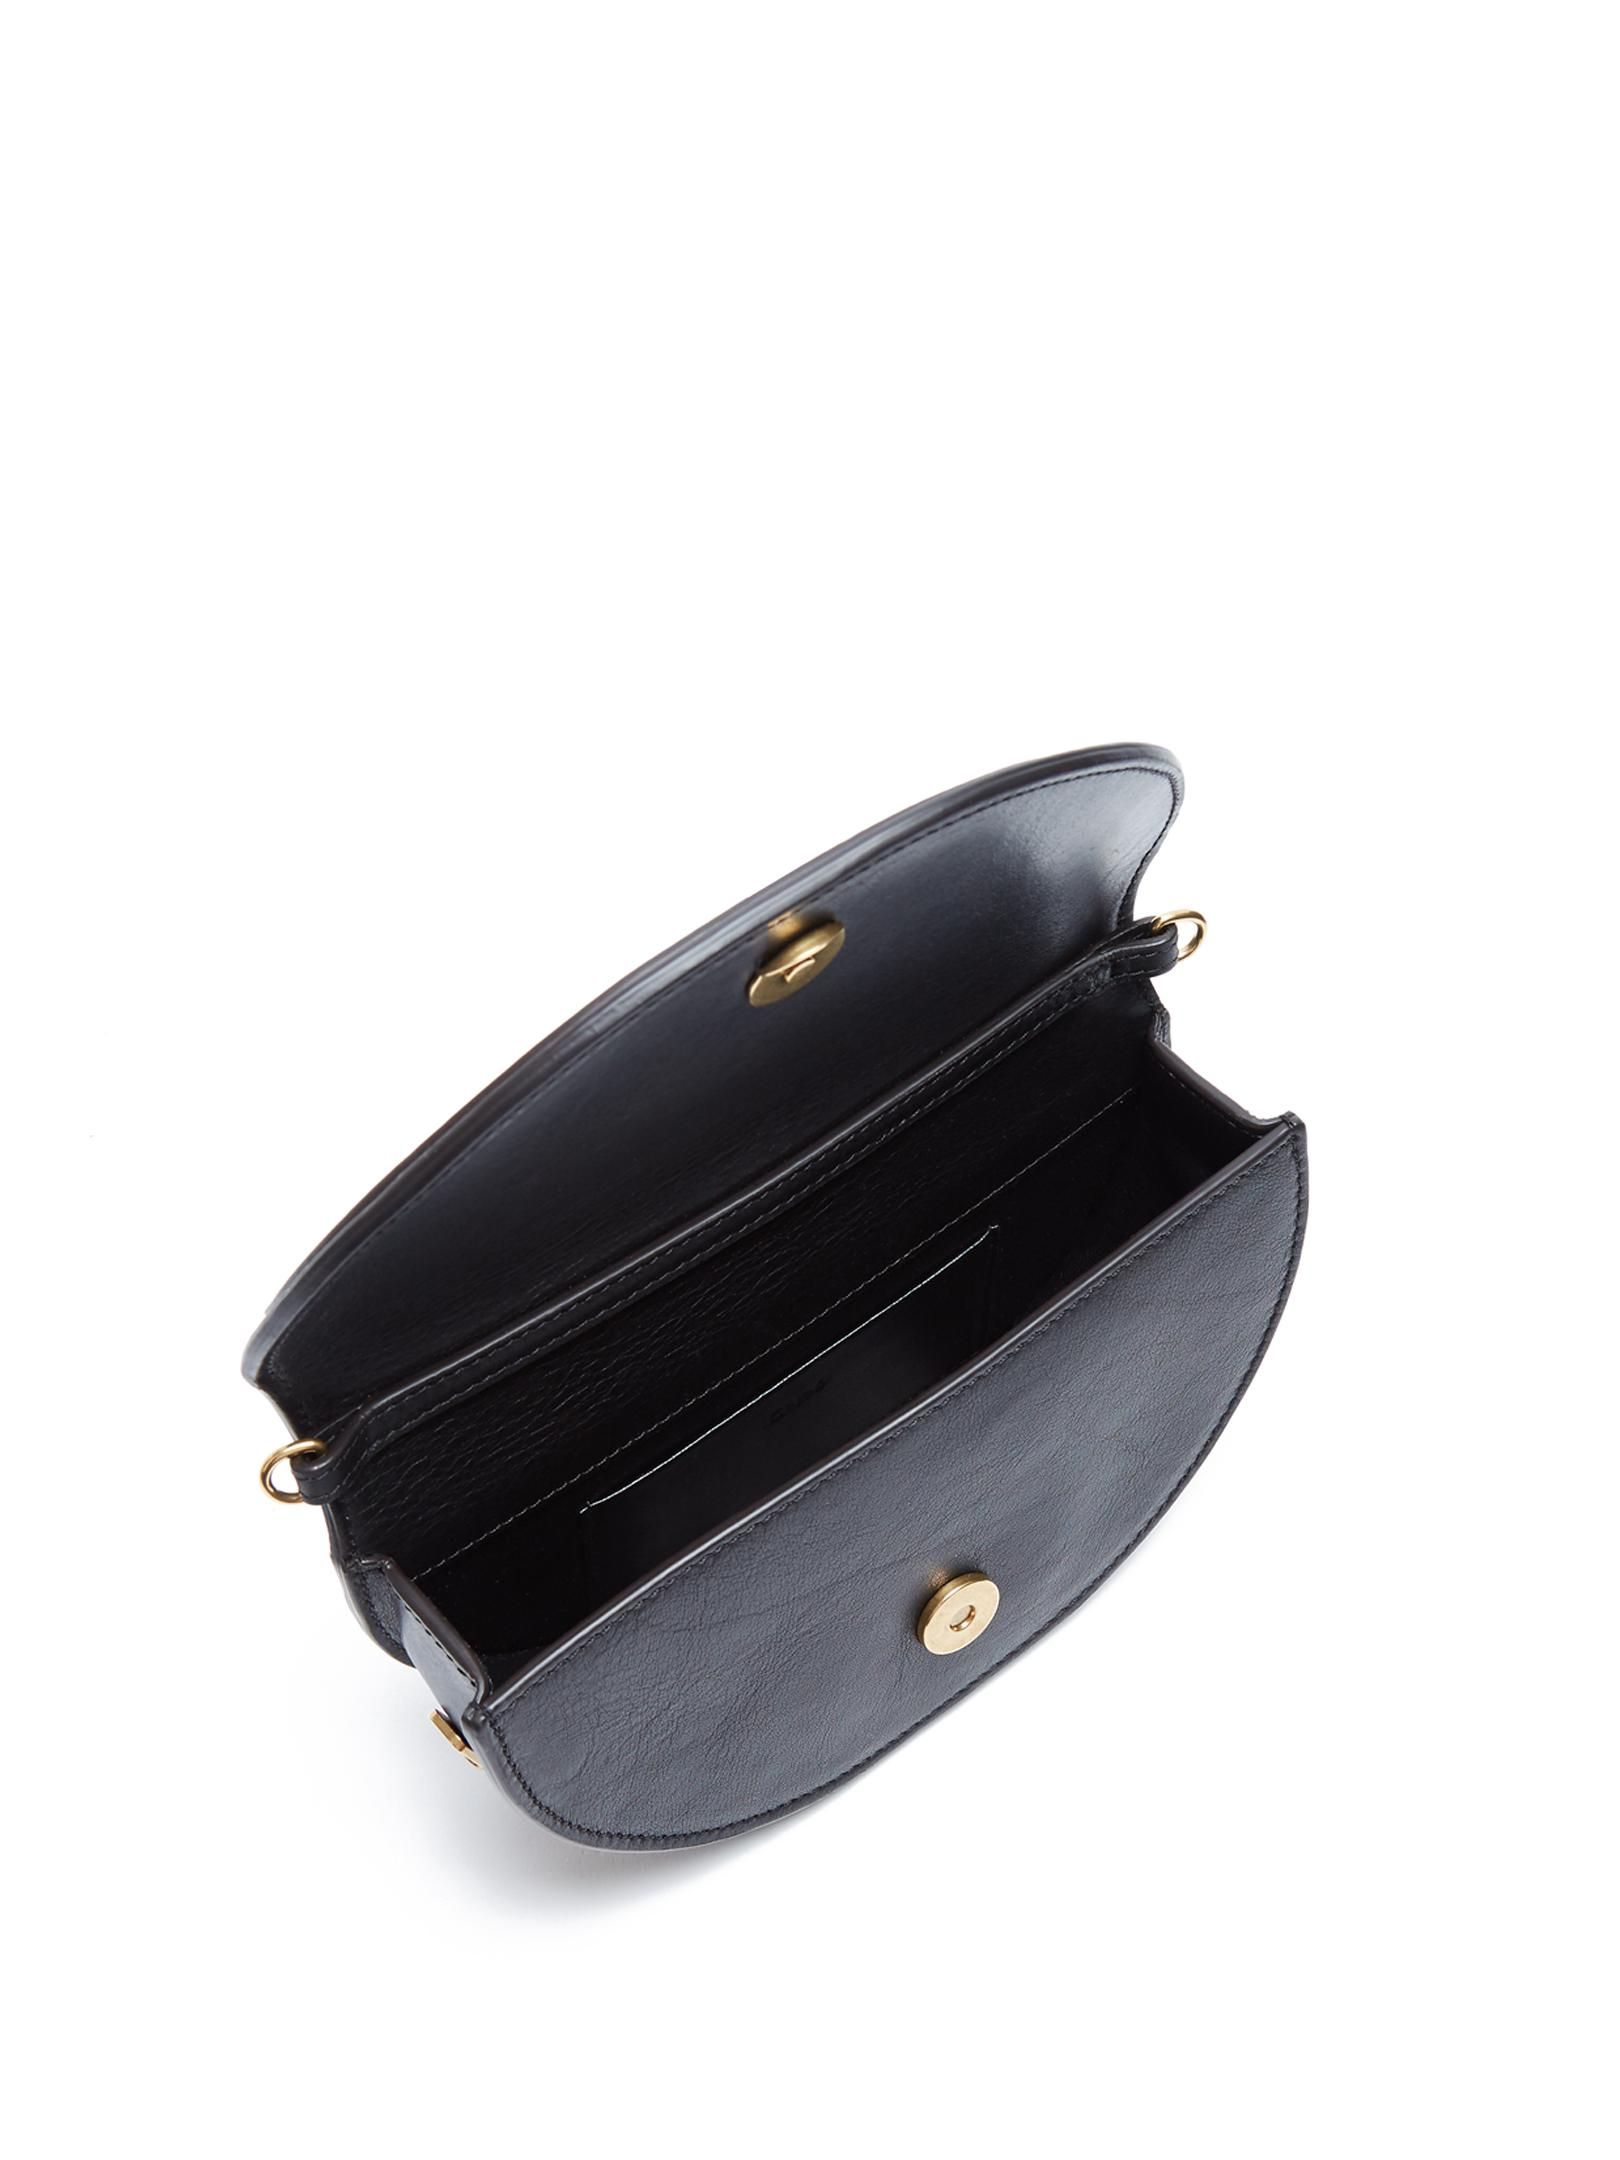 Chloé Leather Nile Minaudière Small Cross-body Bag in Black